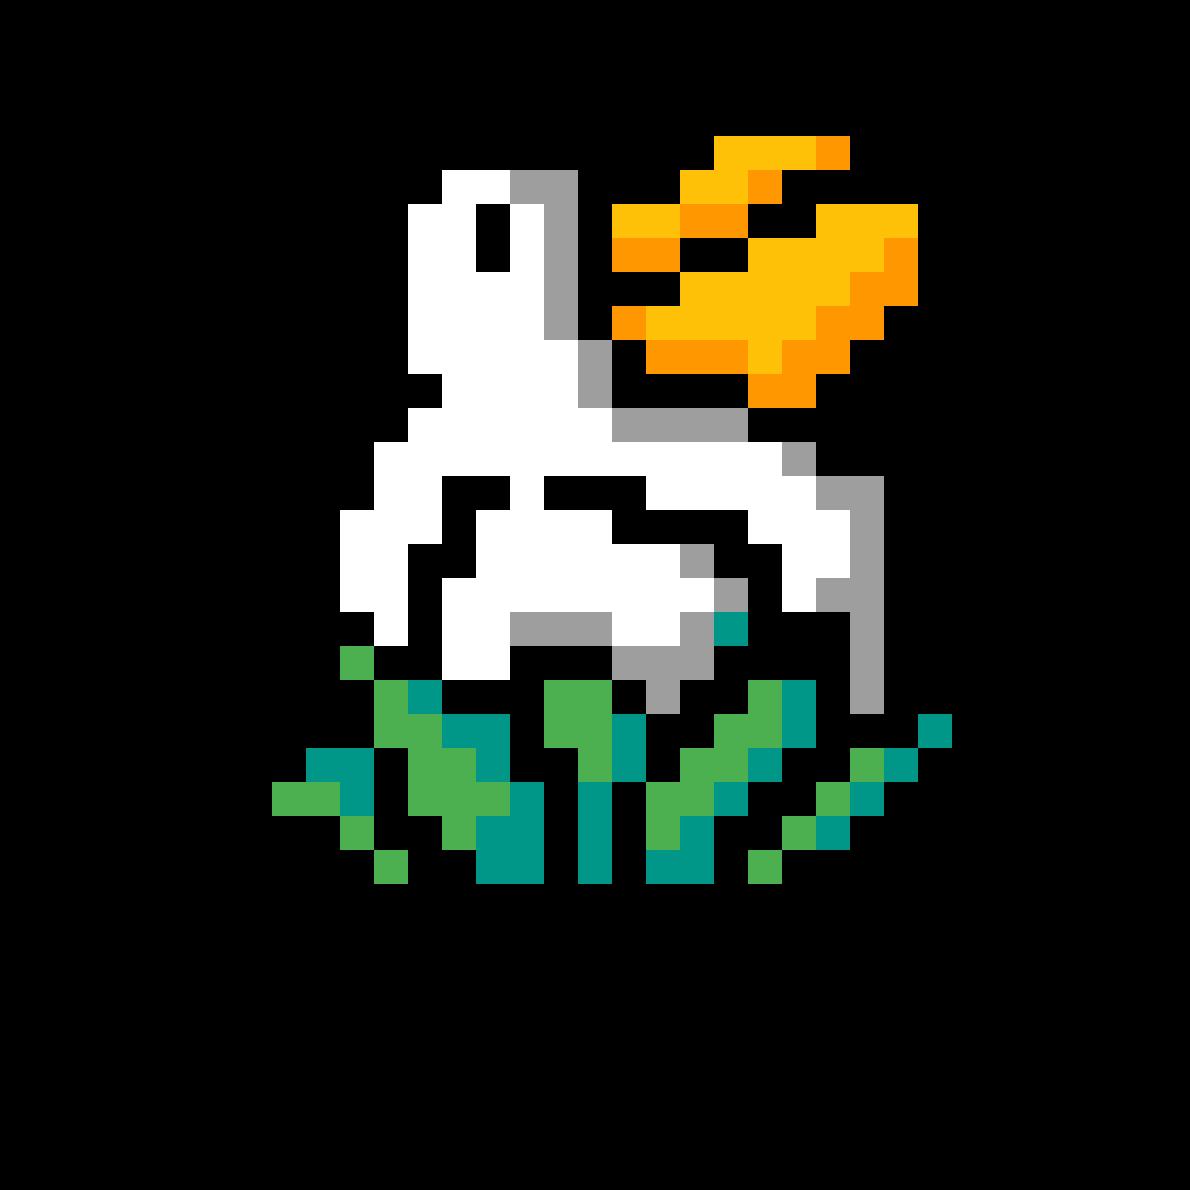 Gooseberry by Cruiser